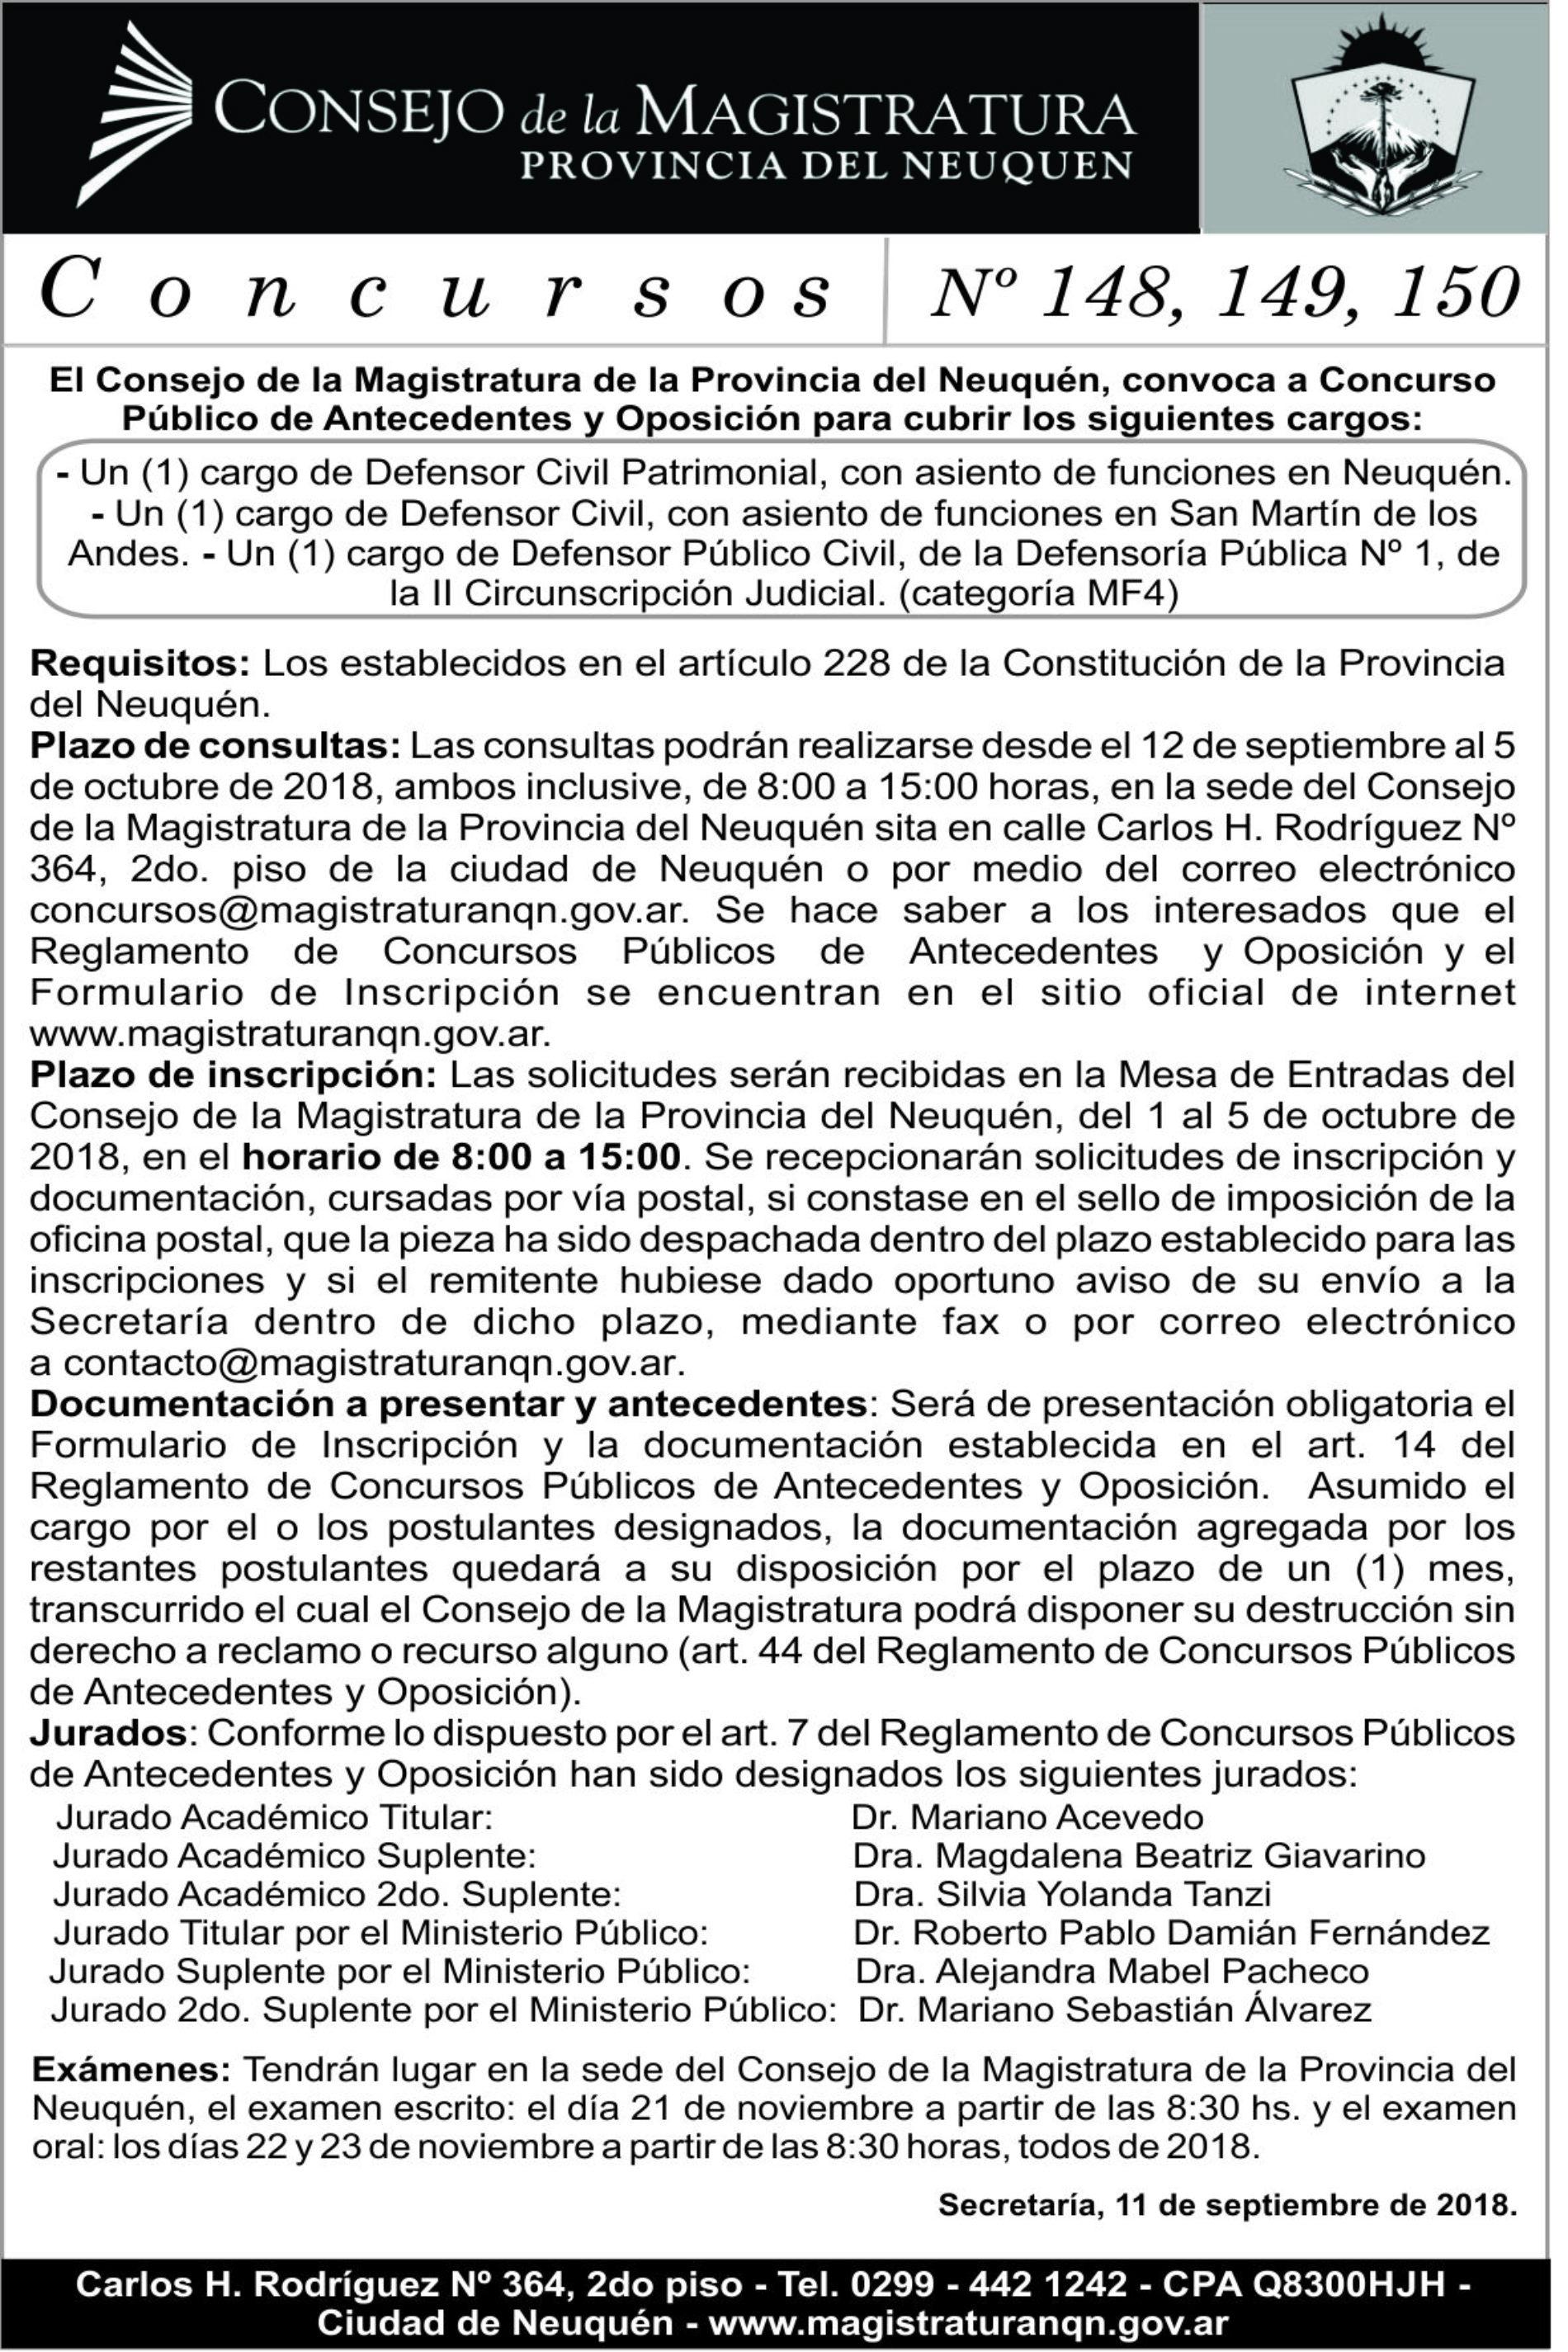 «Consejo de la Magistratura de la Provincia de Neuquén» Concursos N° 148, 149, 150.